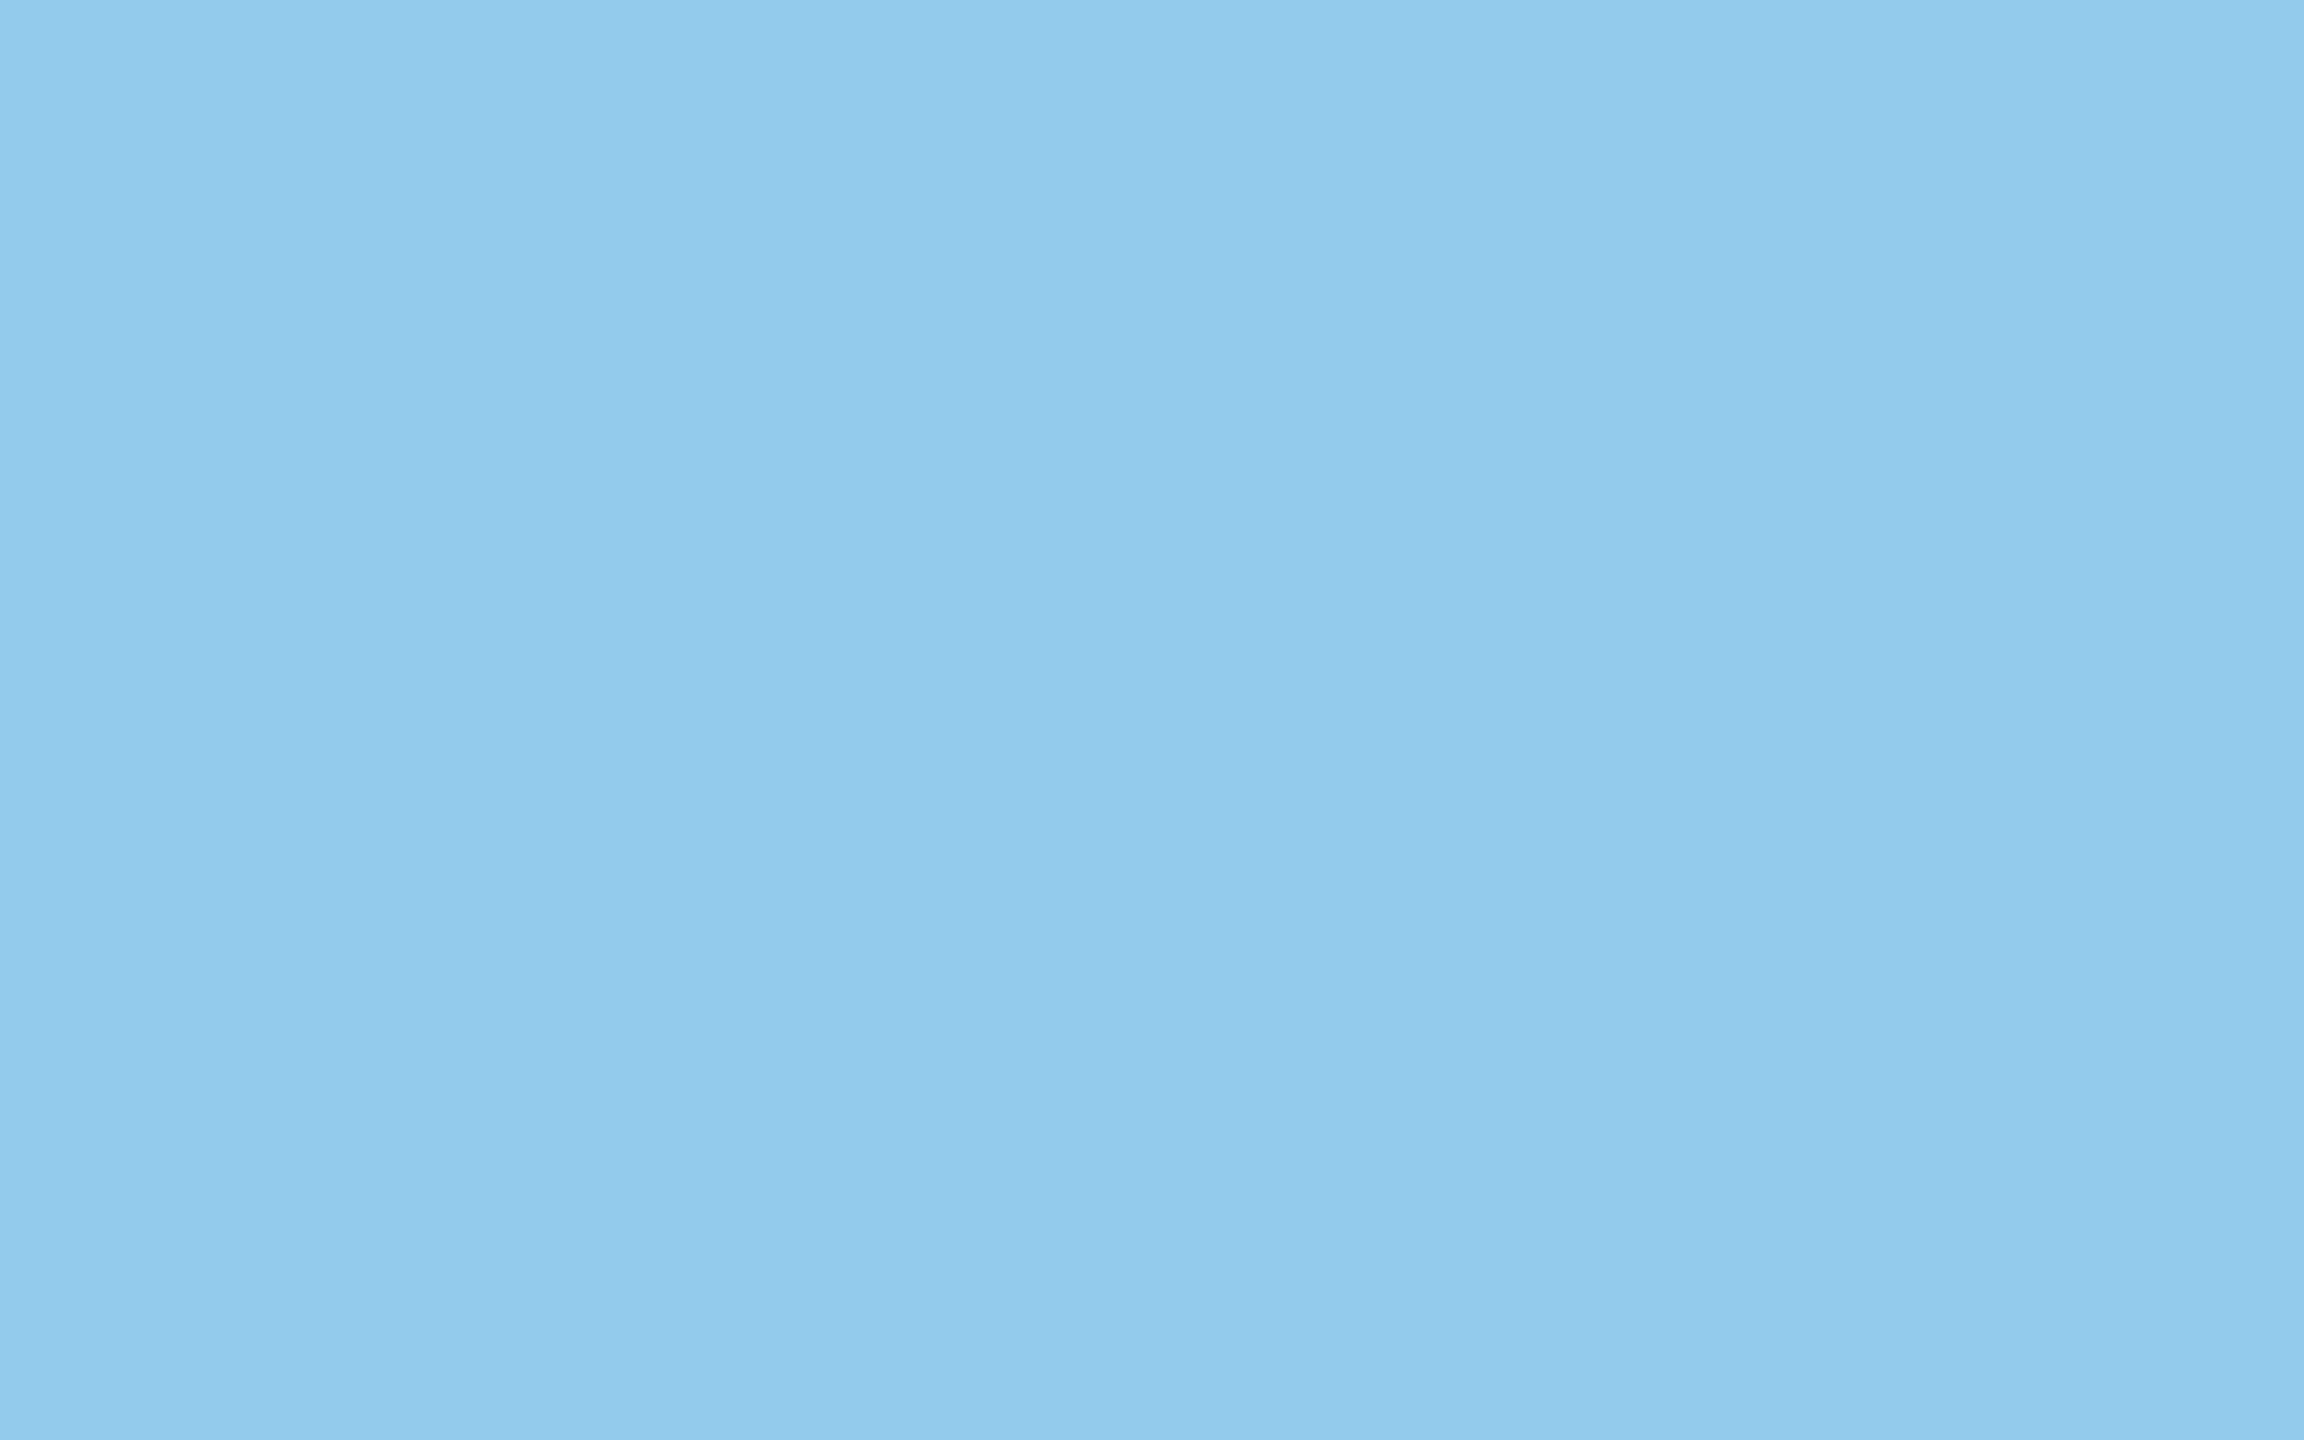 2304x1440 Light Cornflower Blue Solid Color Background